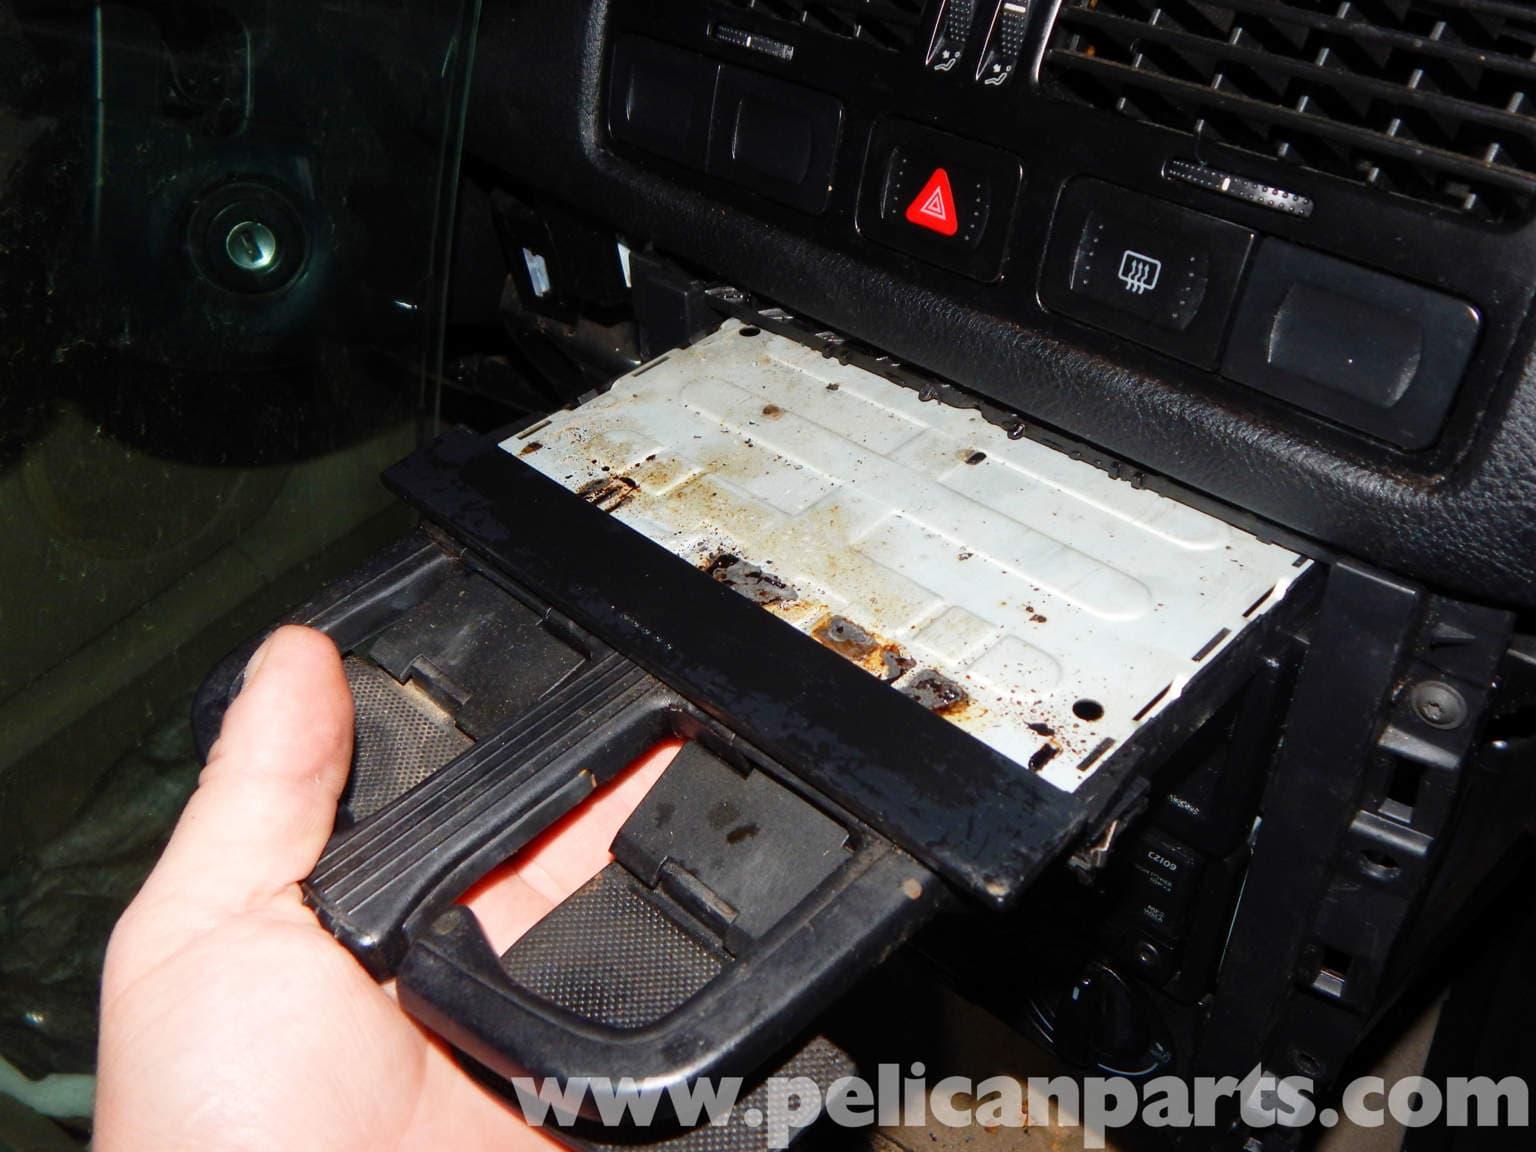 Volkswagen jetta mk4 cup holder replacement jetta mk4 2 0l 1998 2005 pelican parts diy for Vw jetta interior replacement parts